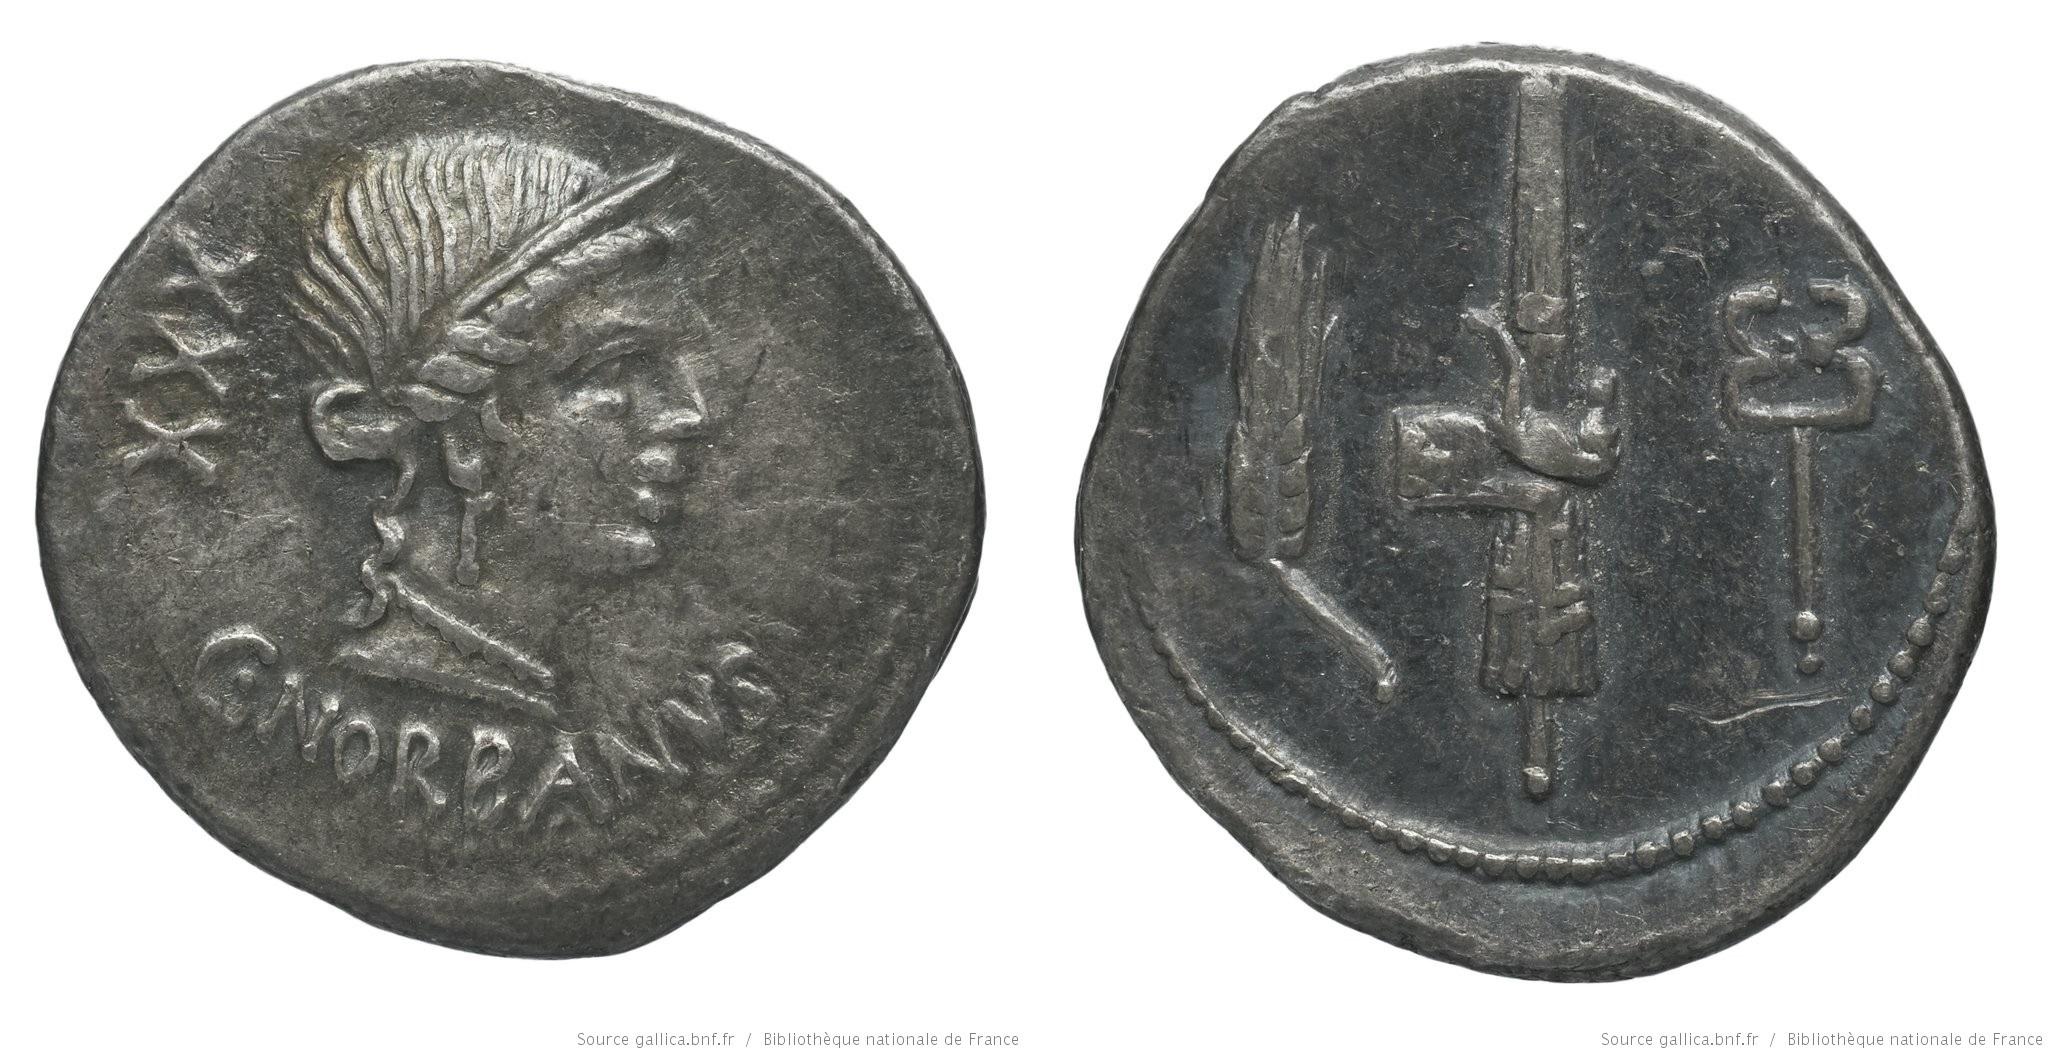 1278NO – Denier Norbana – Caius Norbanus